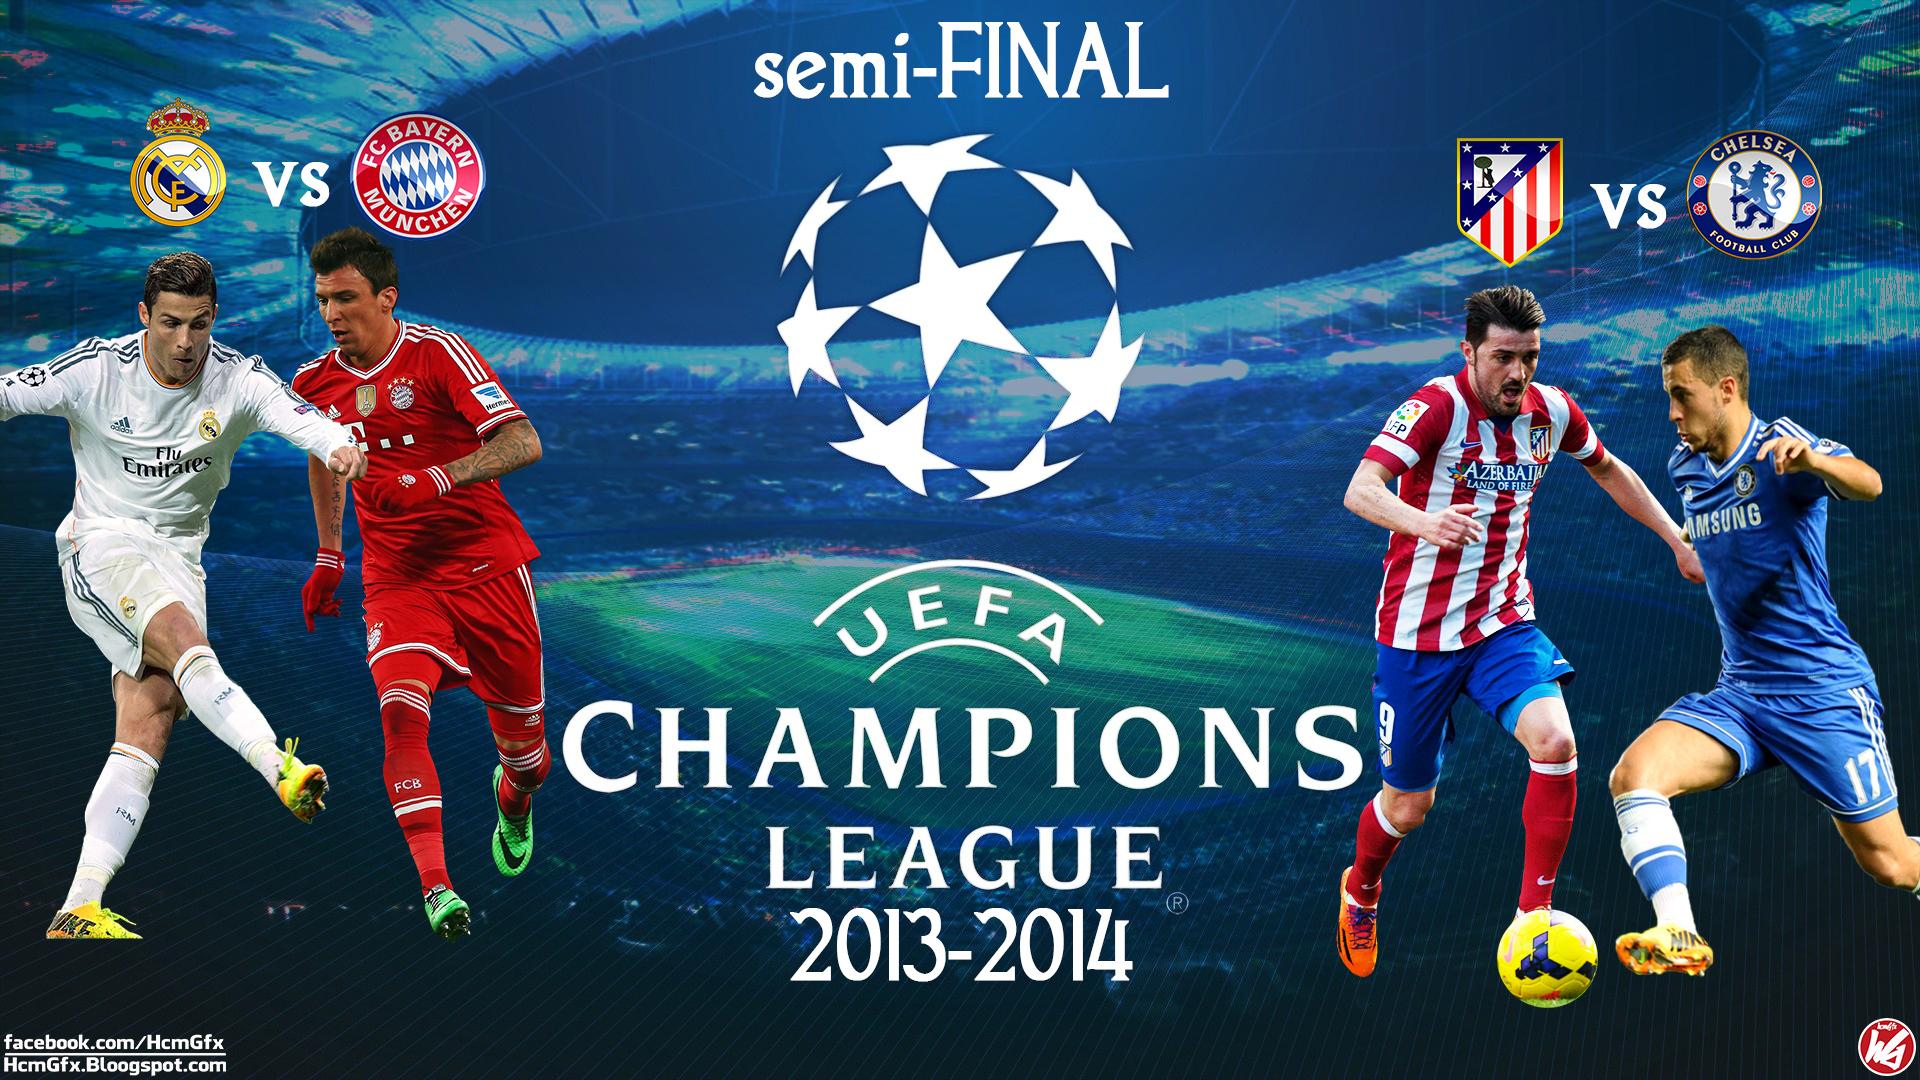 Semi Final Uefa Champions League 20132014 By Hichamhcm